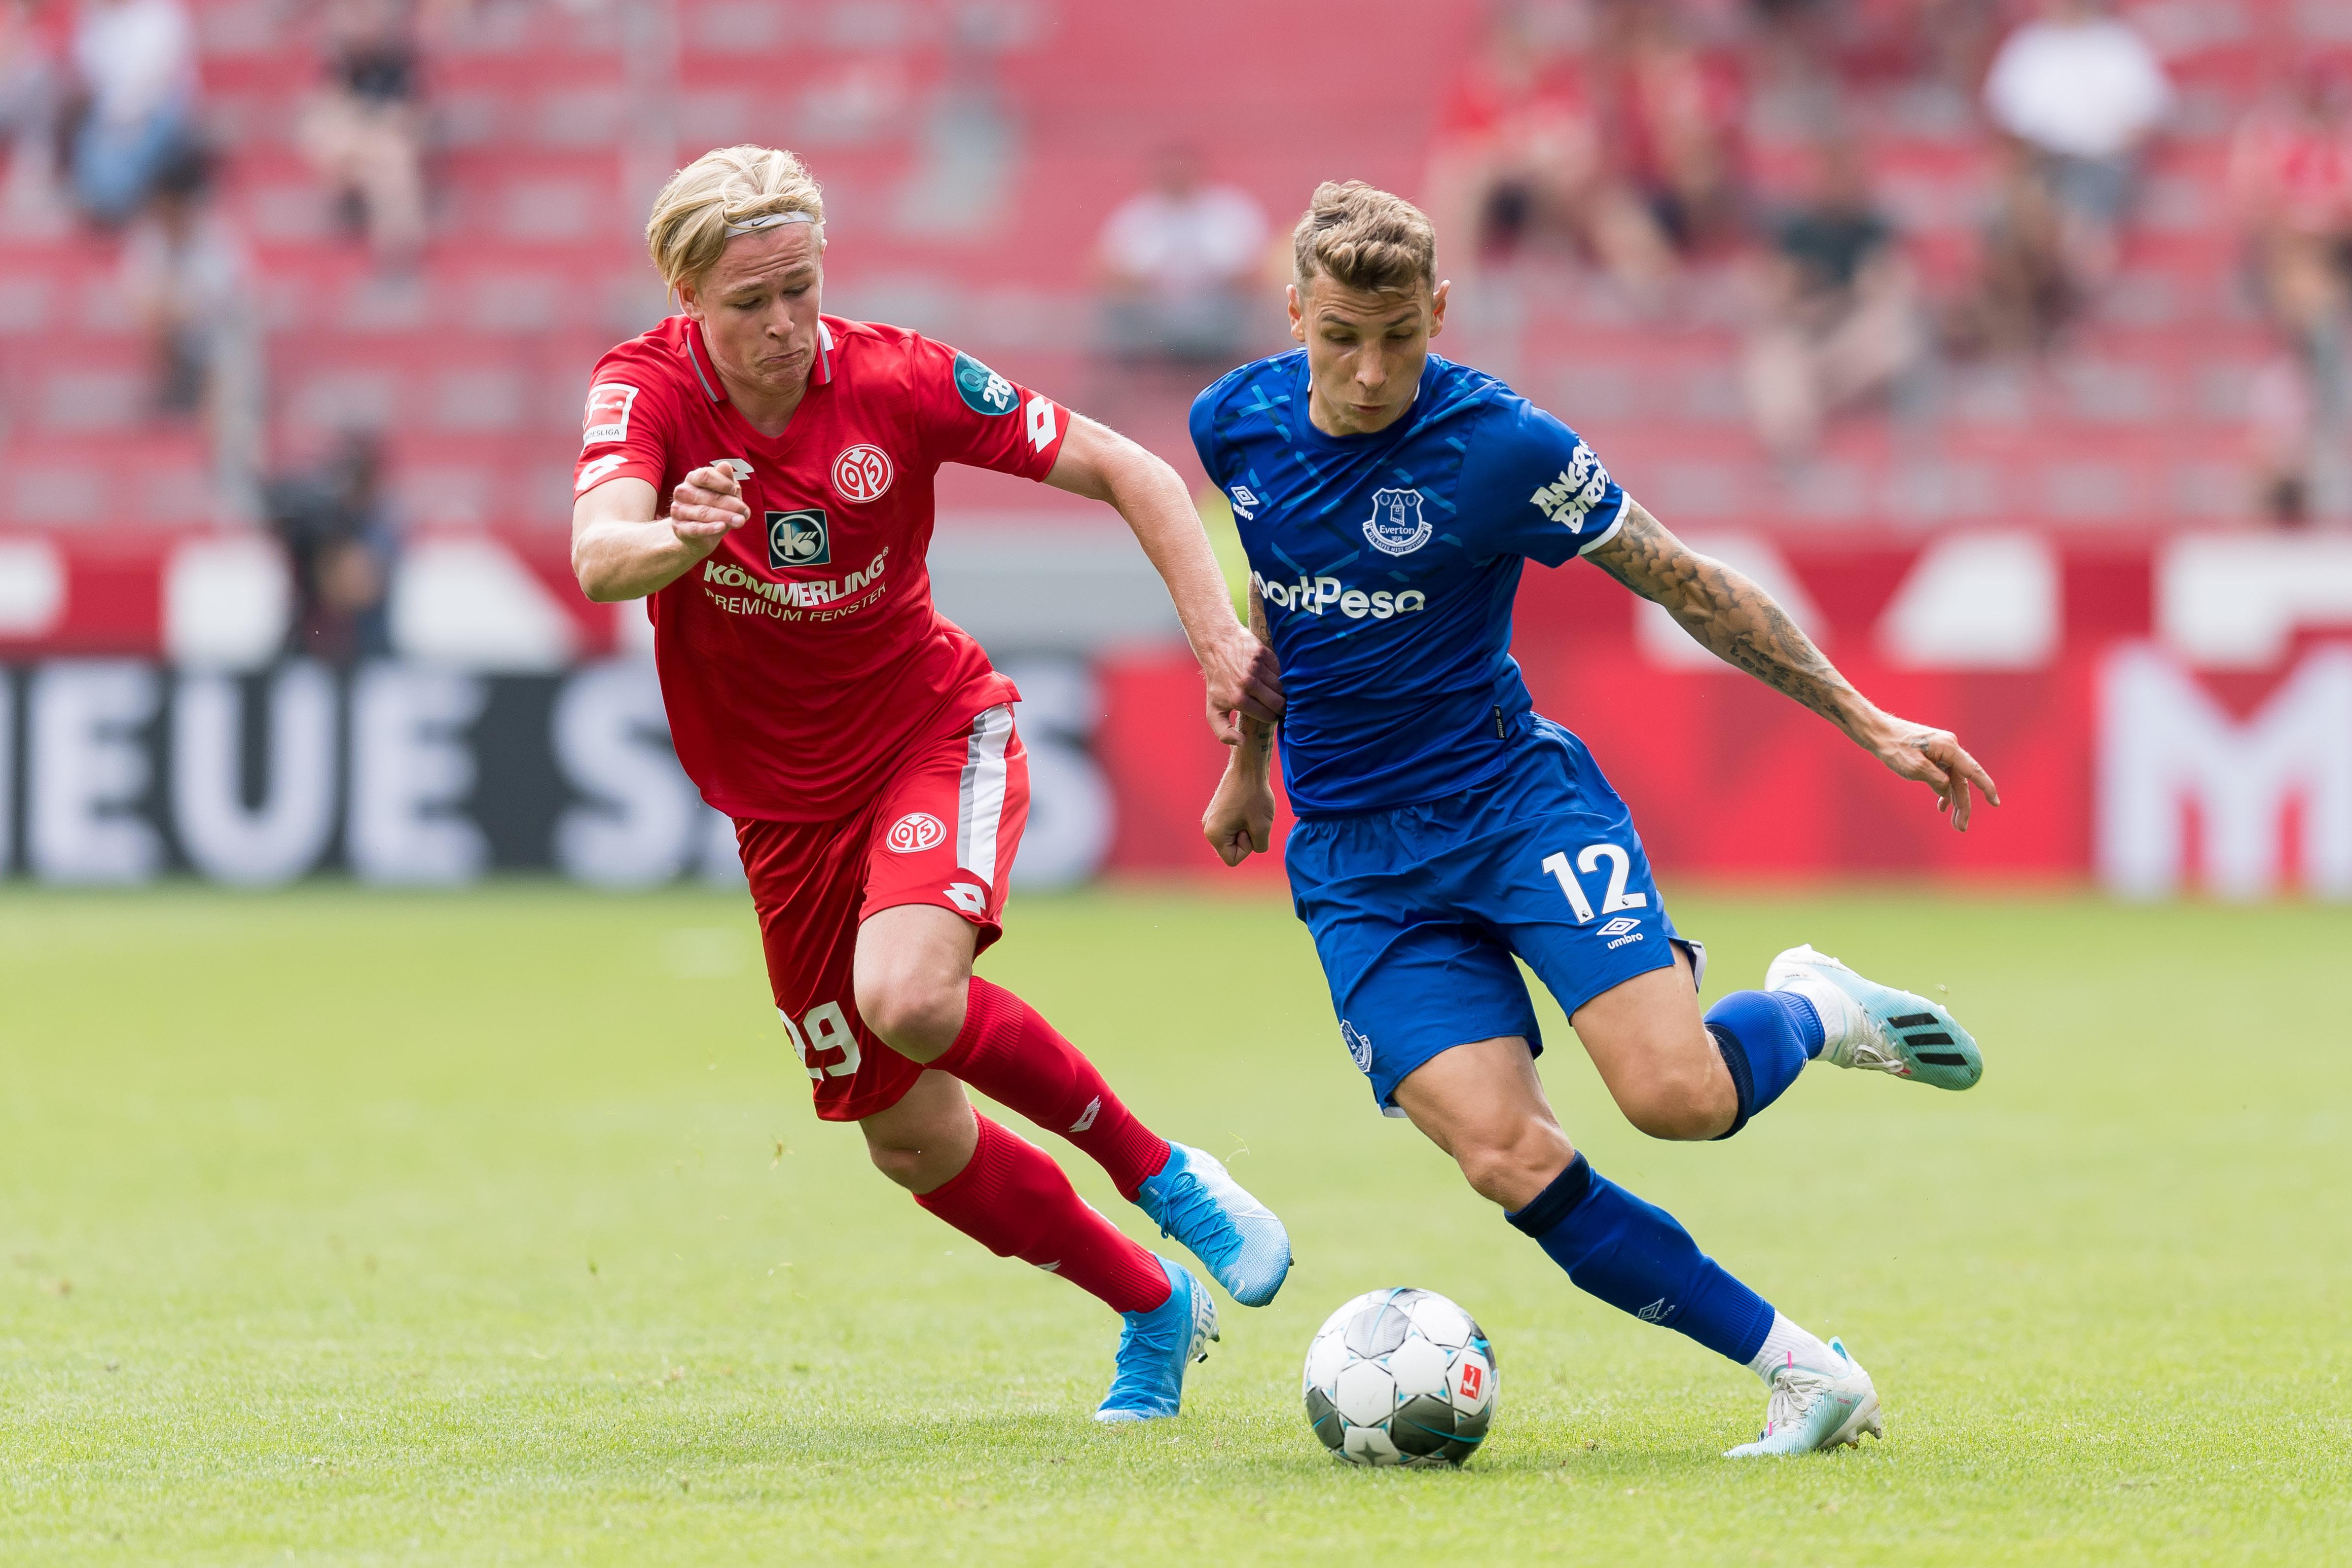 1. FSV Mainz 05 v FC Everton - Opel Cup 2019